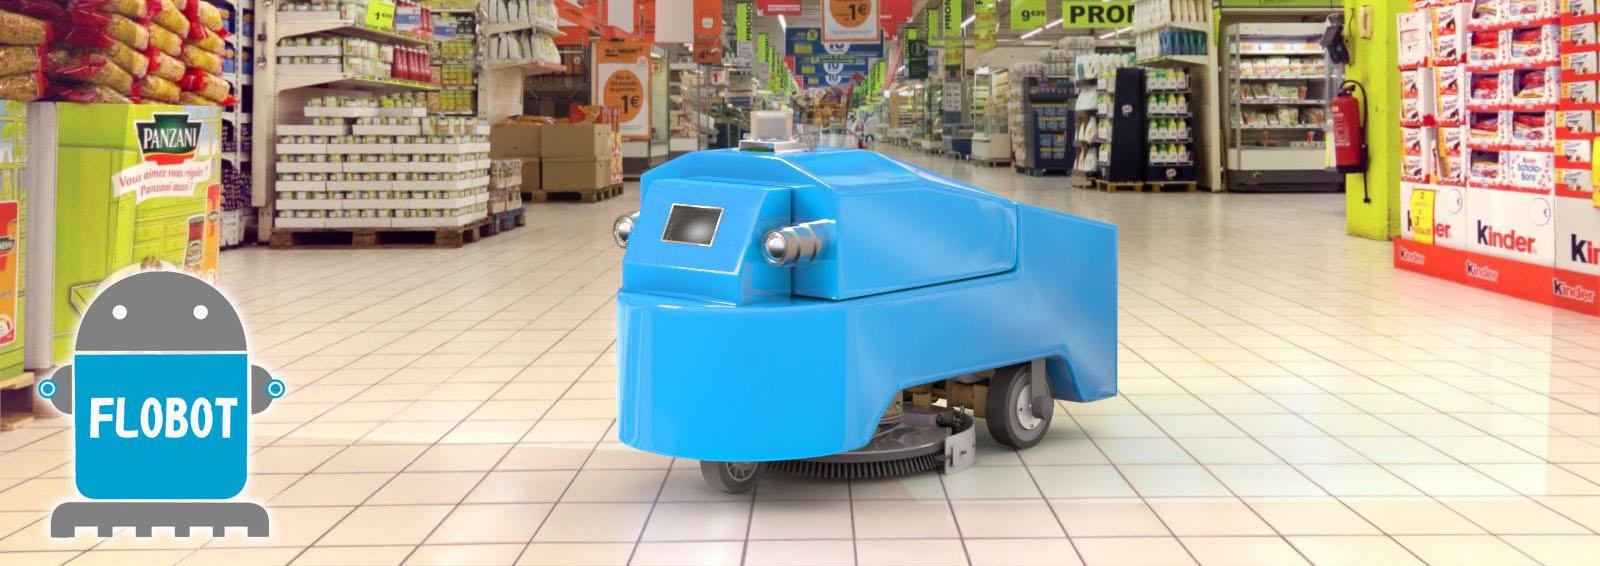 Supermarket_C1